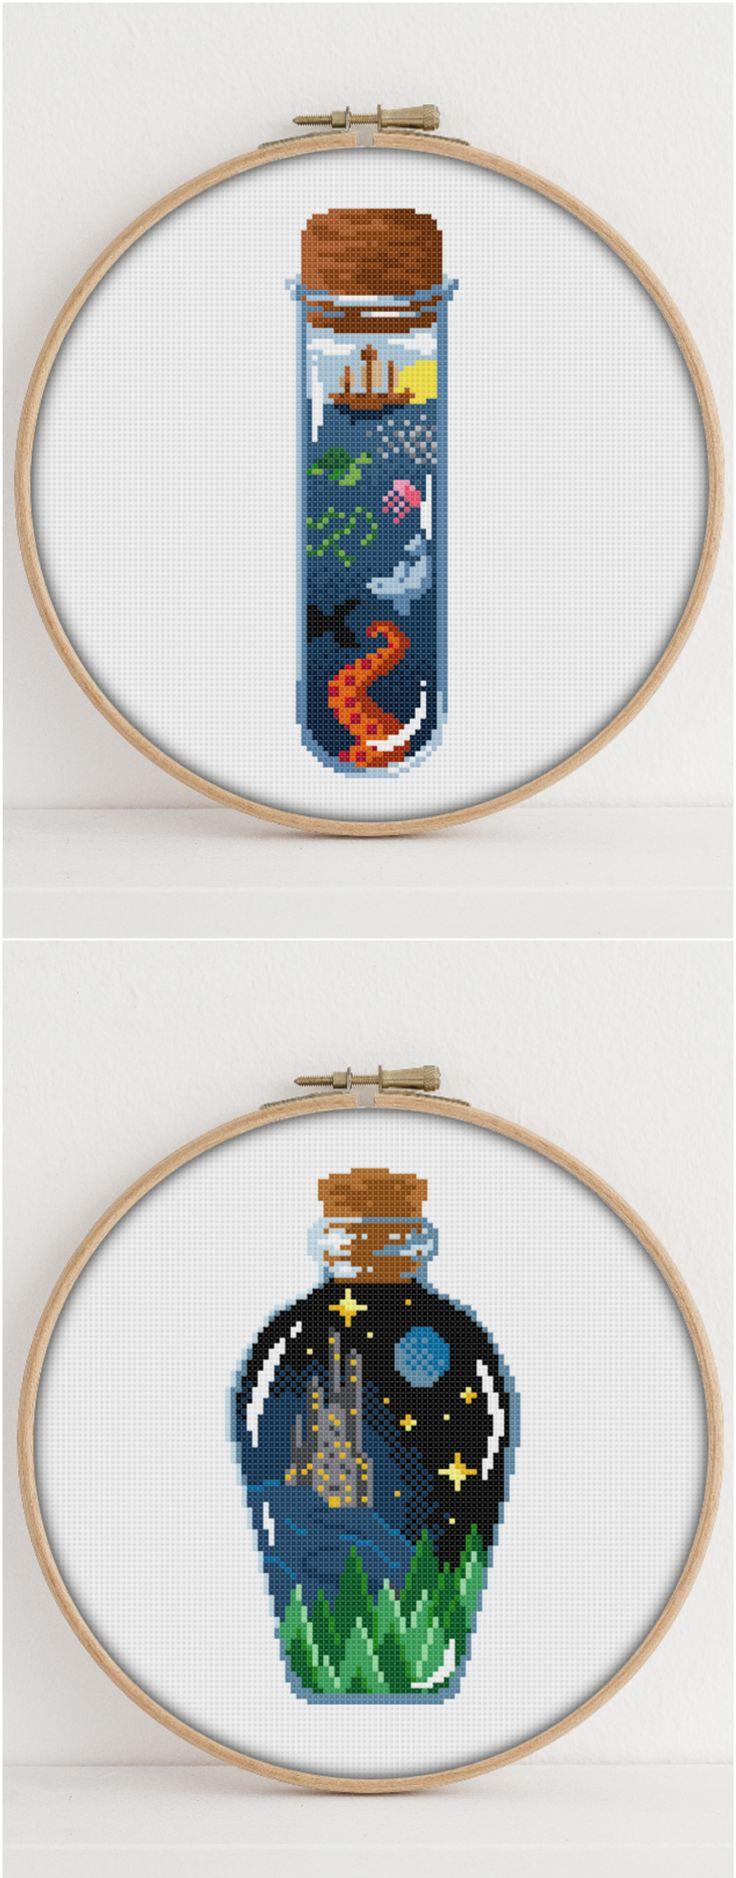 Magic Bottle cross stitch - Fairytale - Ocean #crossstitch #crossstitchpattern